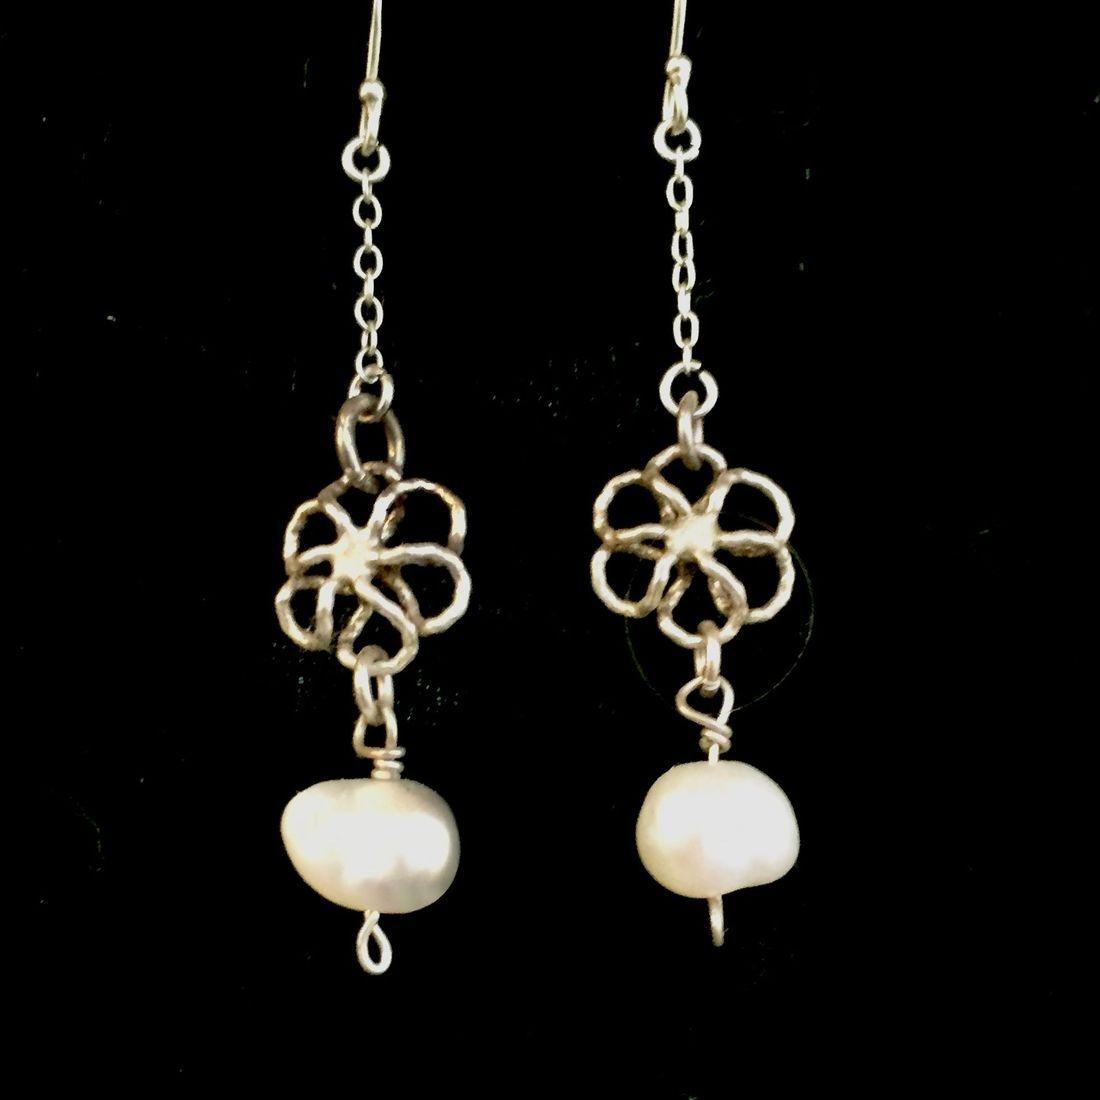 Handmade sterling and pearl earrings on sterling hooks